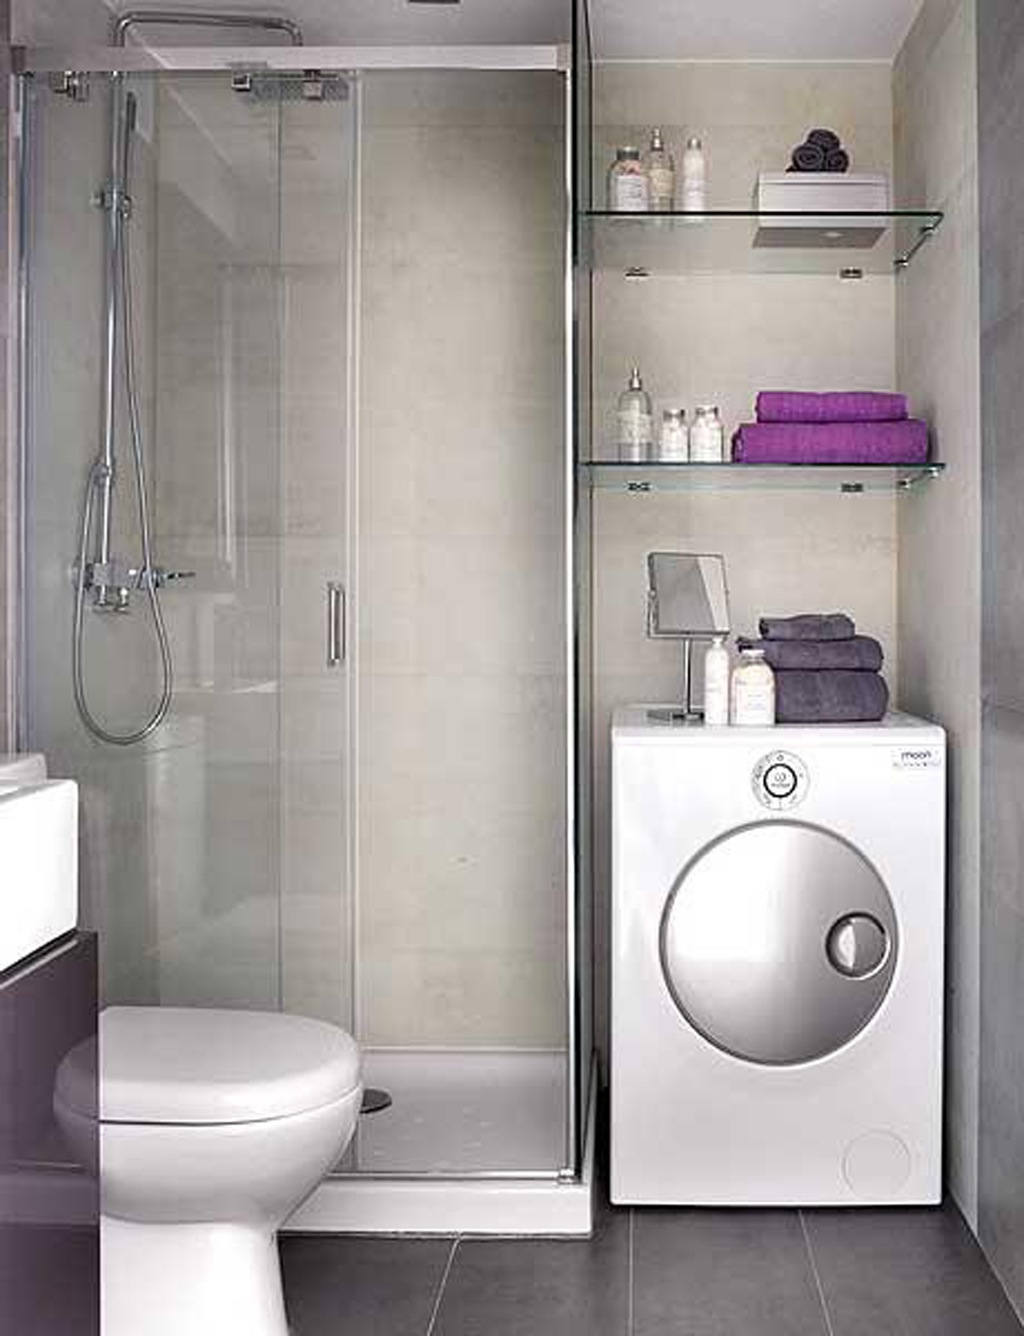 صورة ديكور حمامات صغيرة , استايلات حمامات